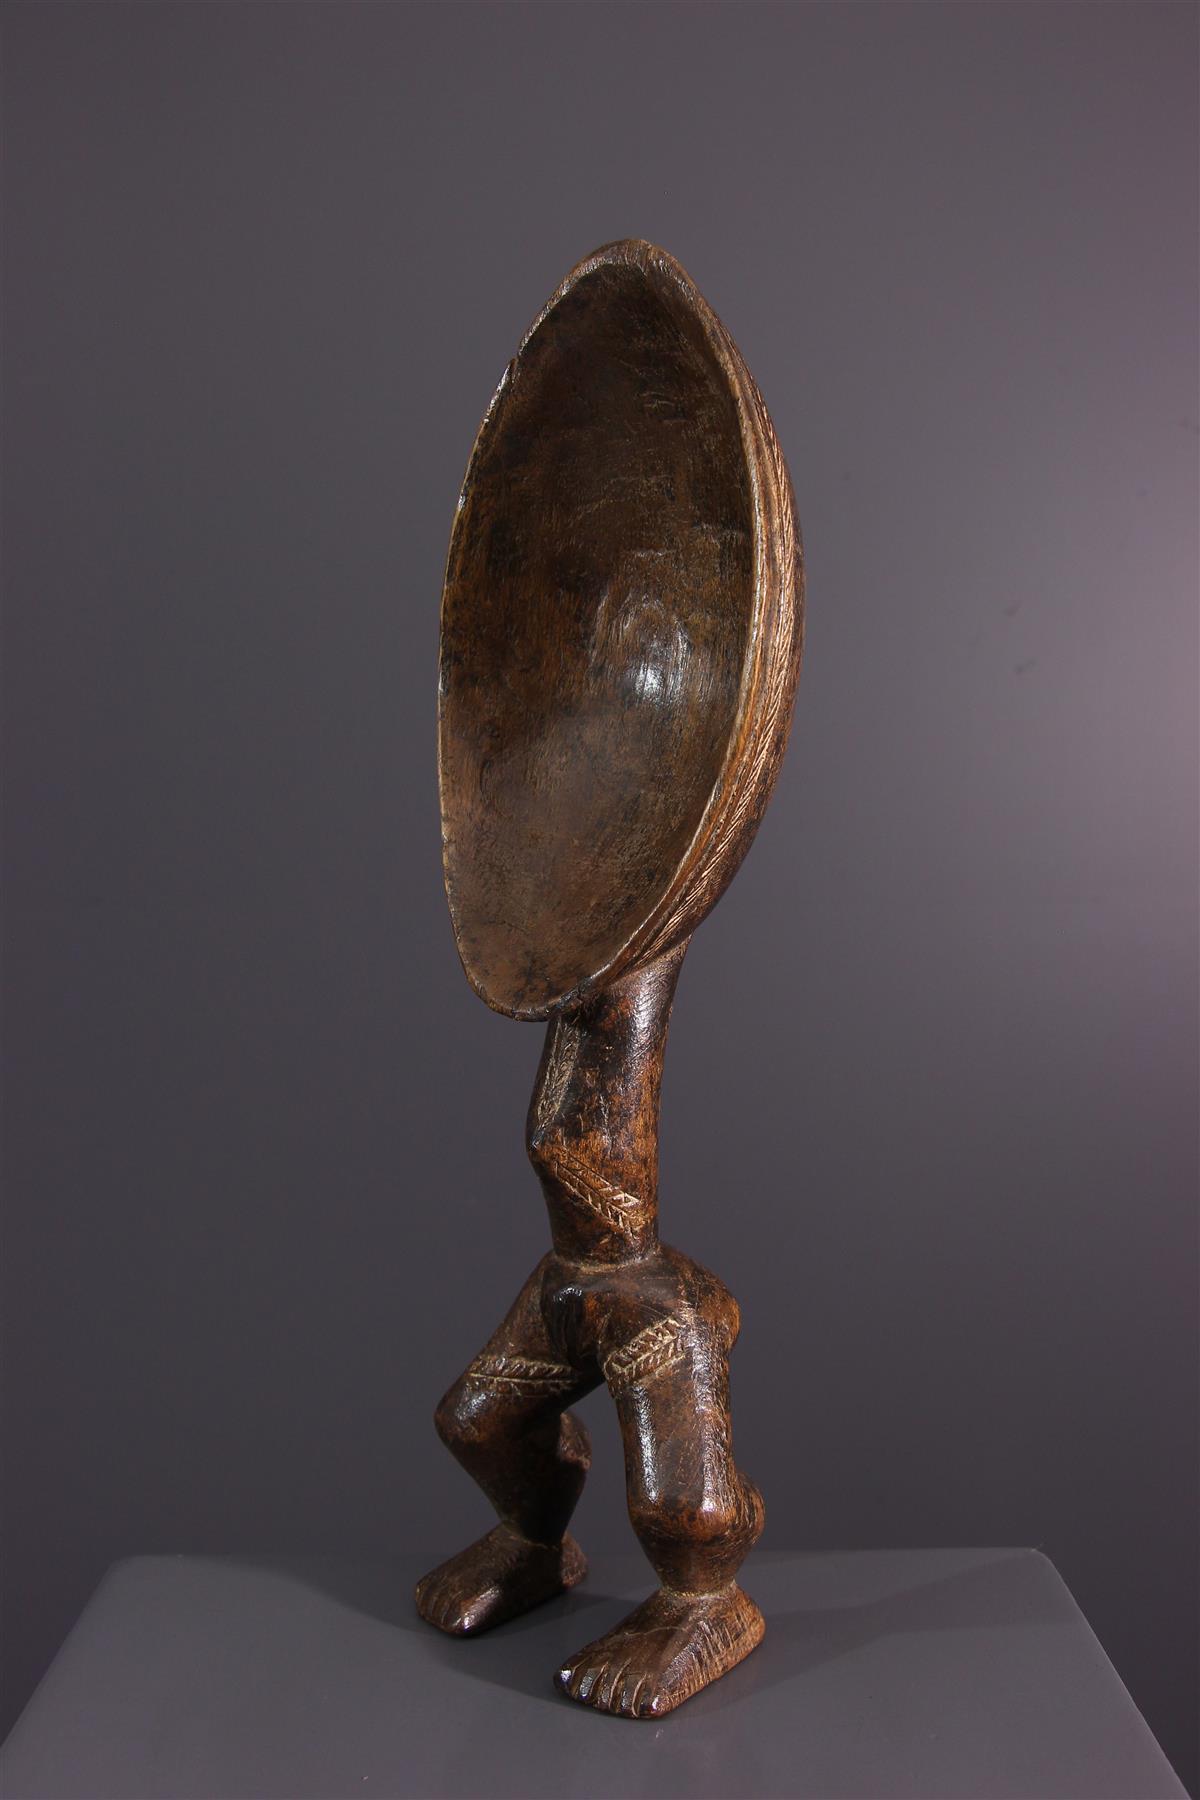 Spoon Dan - African art